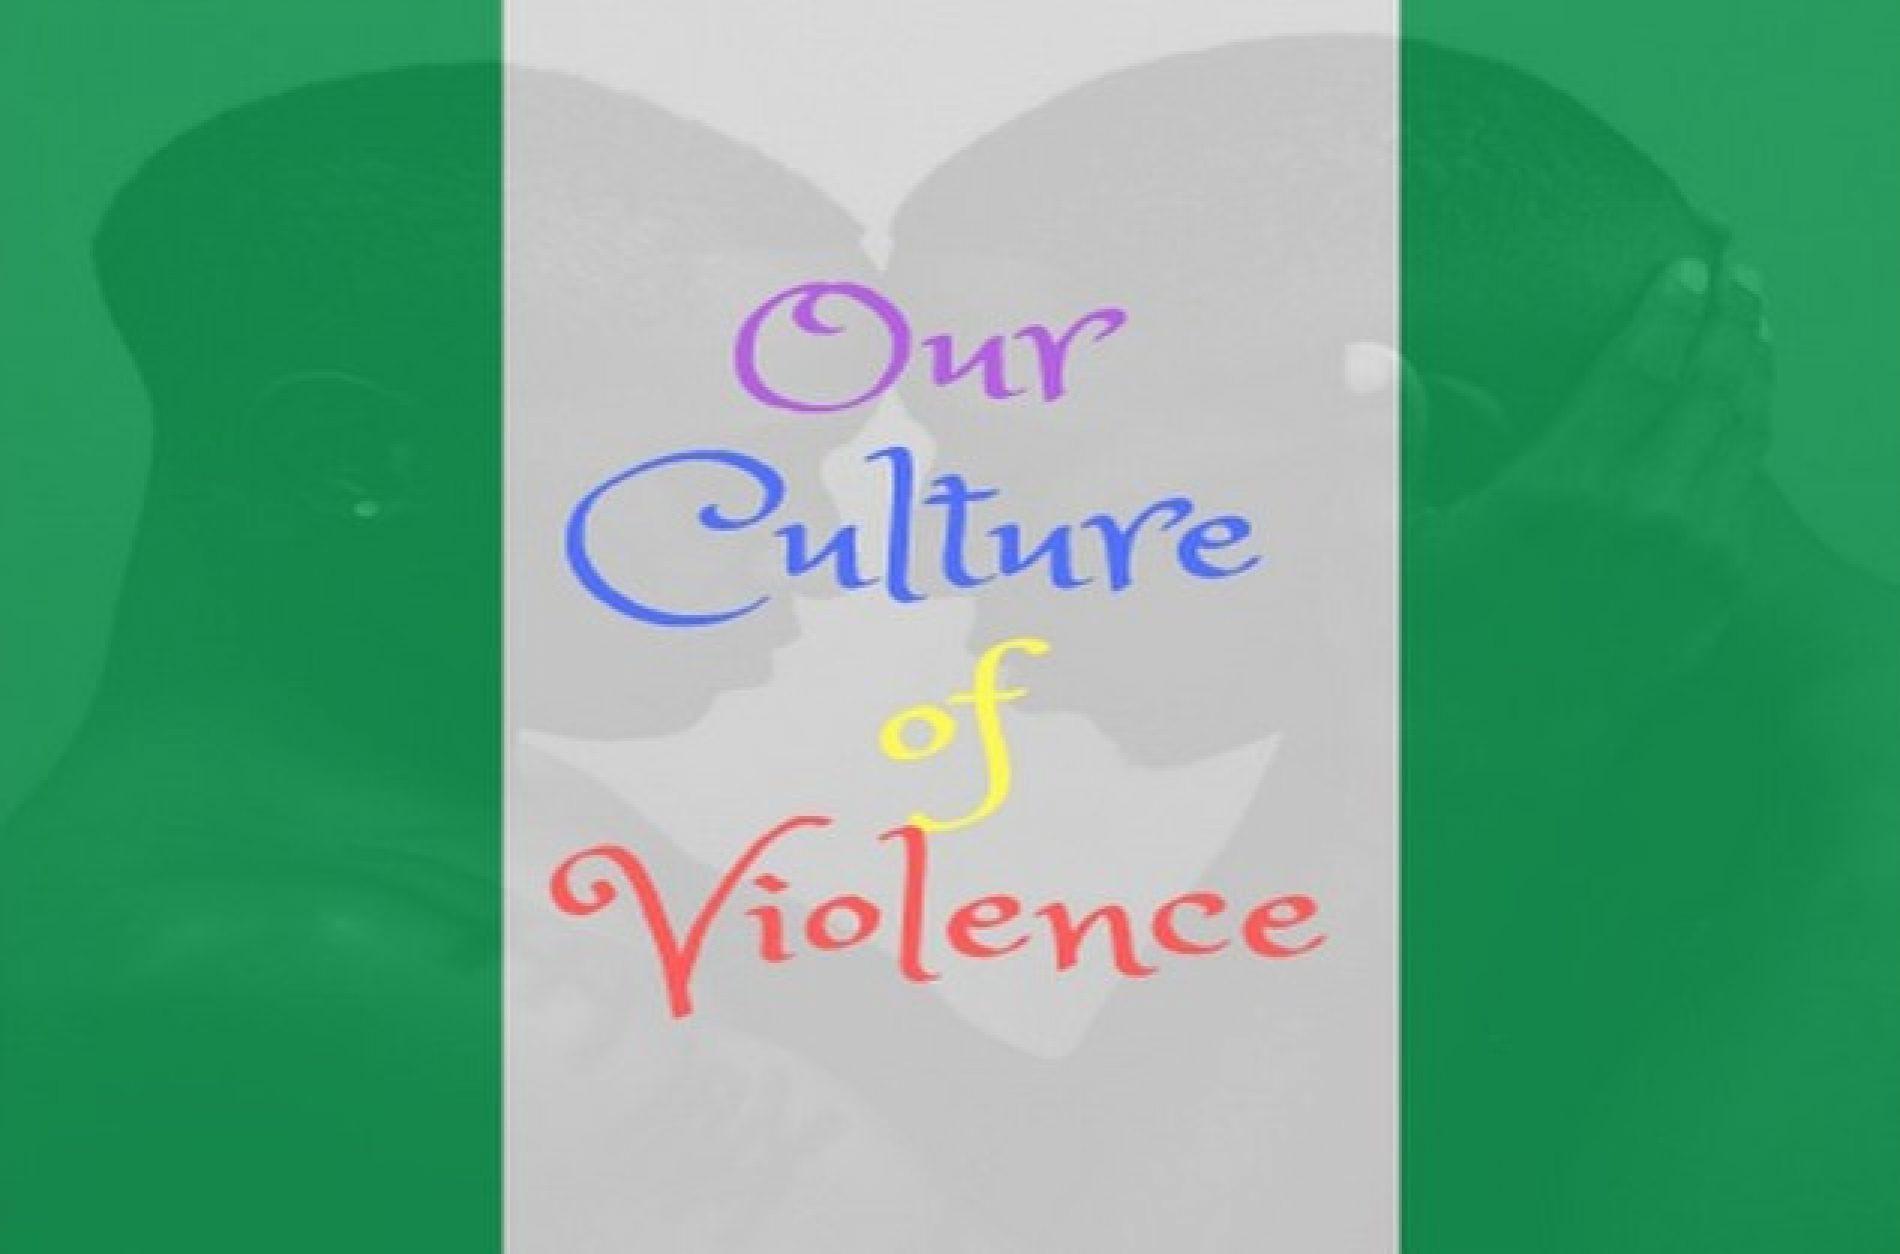 Homophobic Rhetoric And Nigeria's Culture Of Violence (A Piece By Ayo Sogunro)